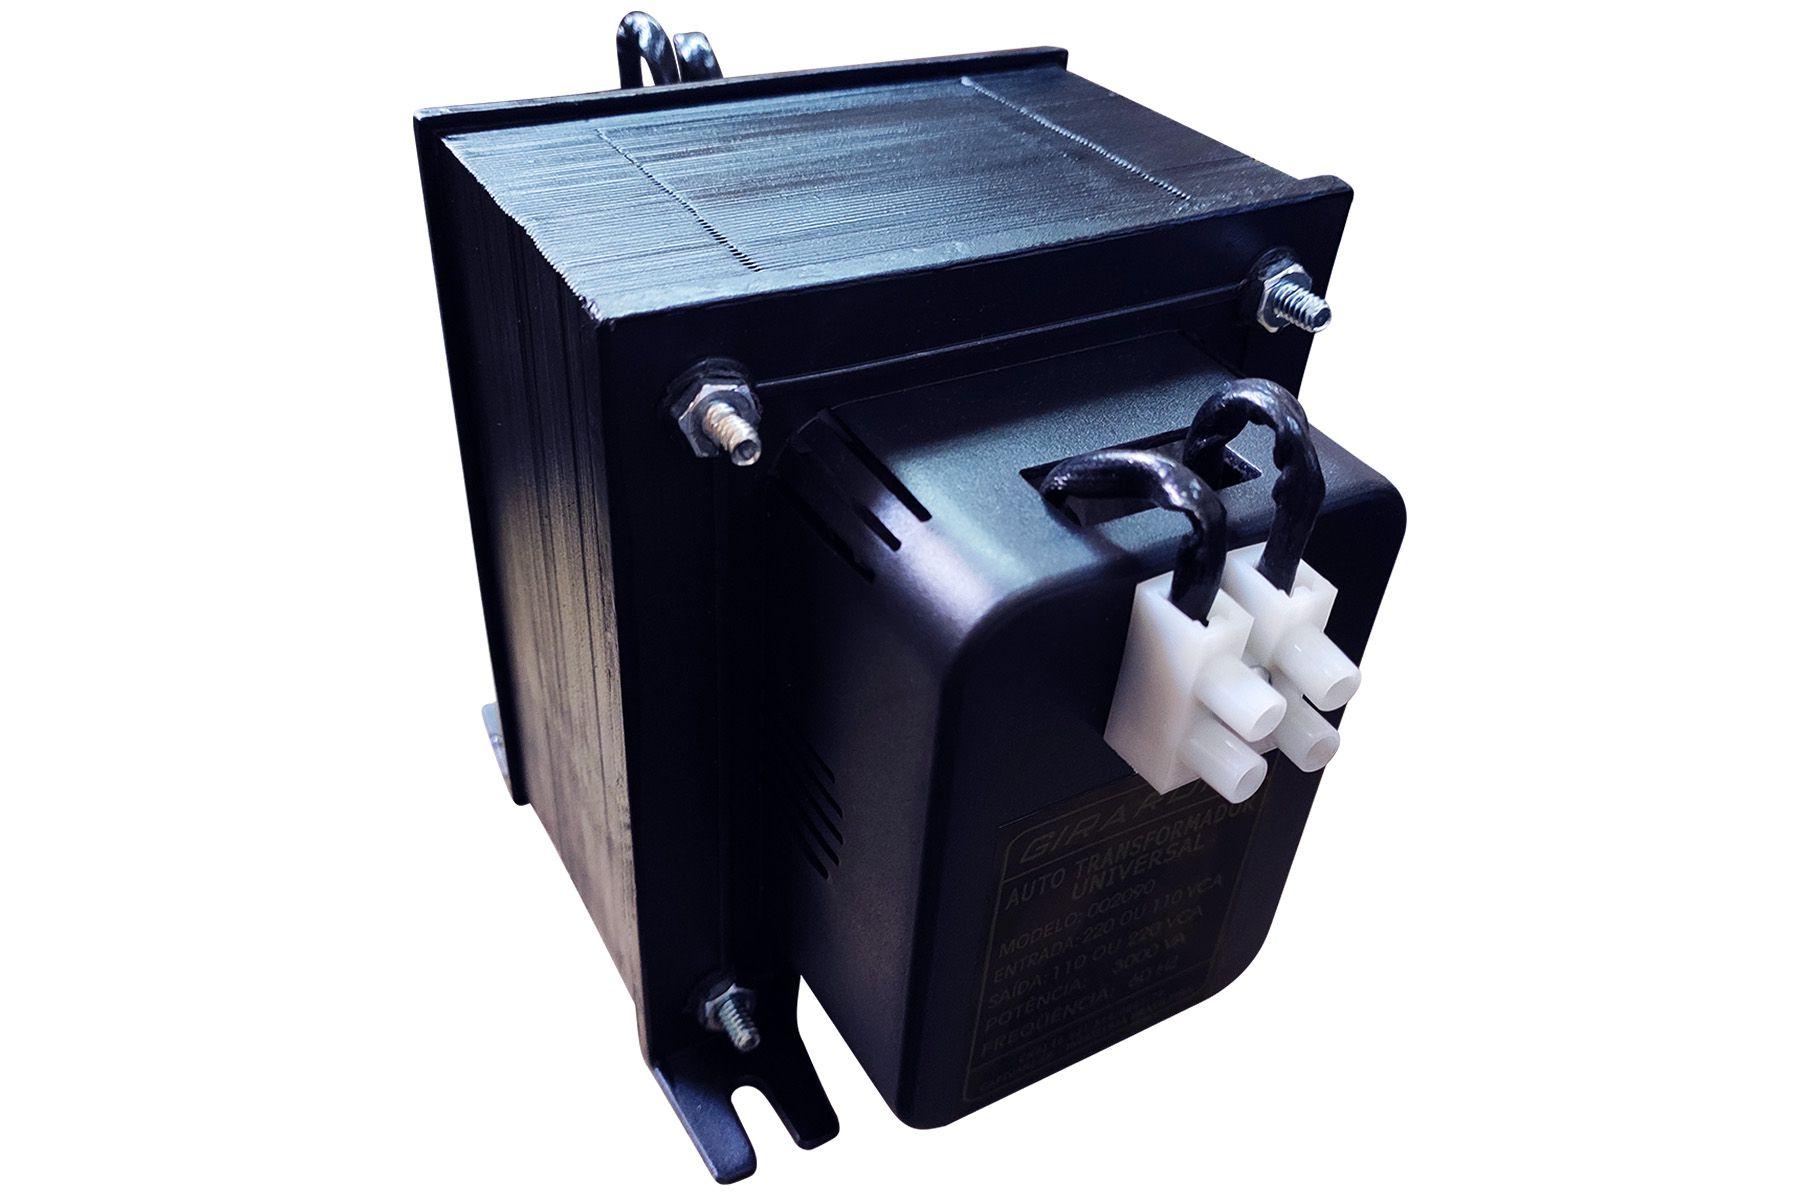 Autotransformador 5000 VA Profissional 127 / 220 V e 220 / 127 V GIRARDI